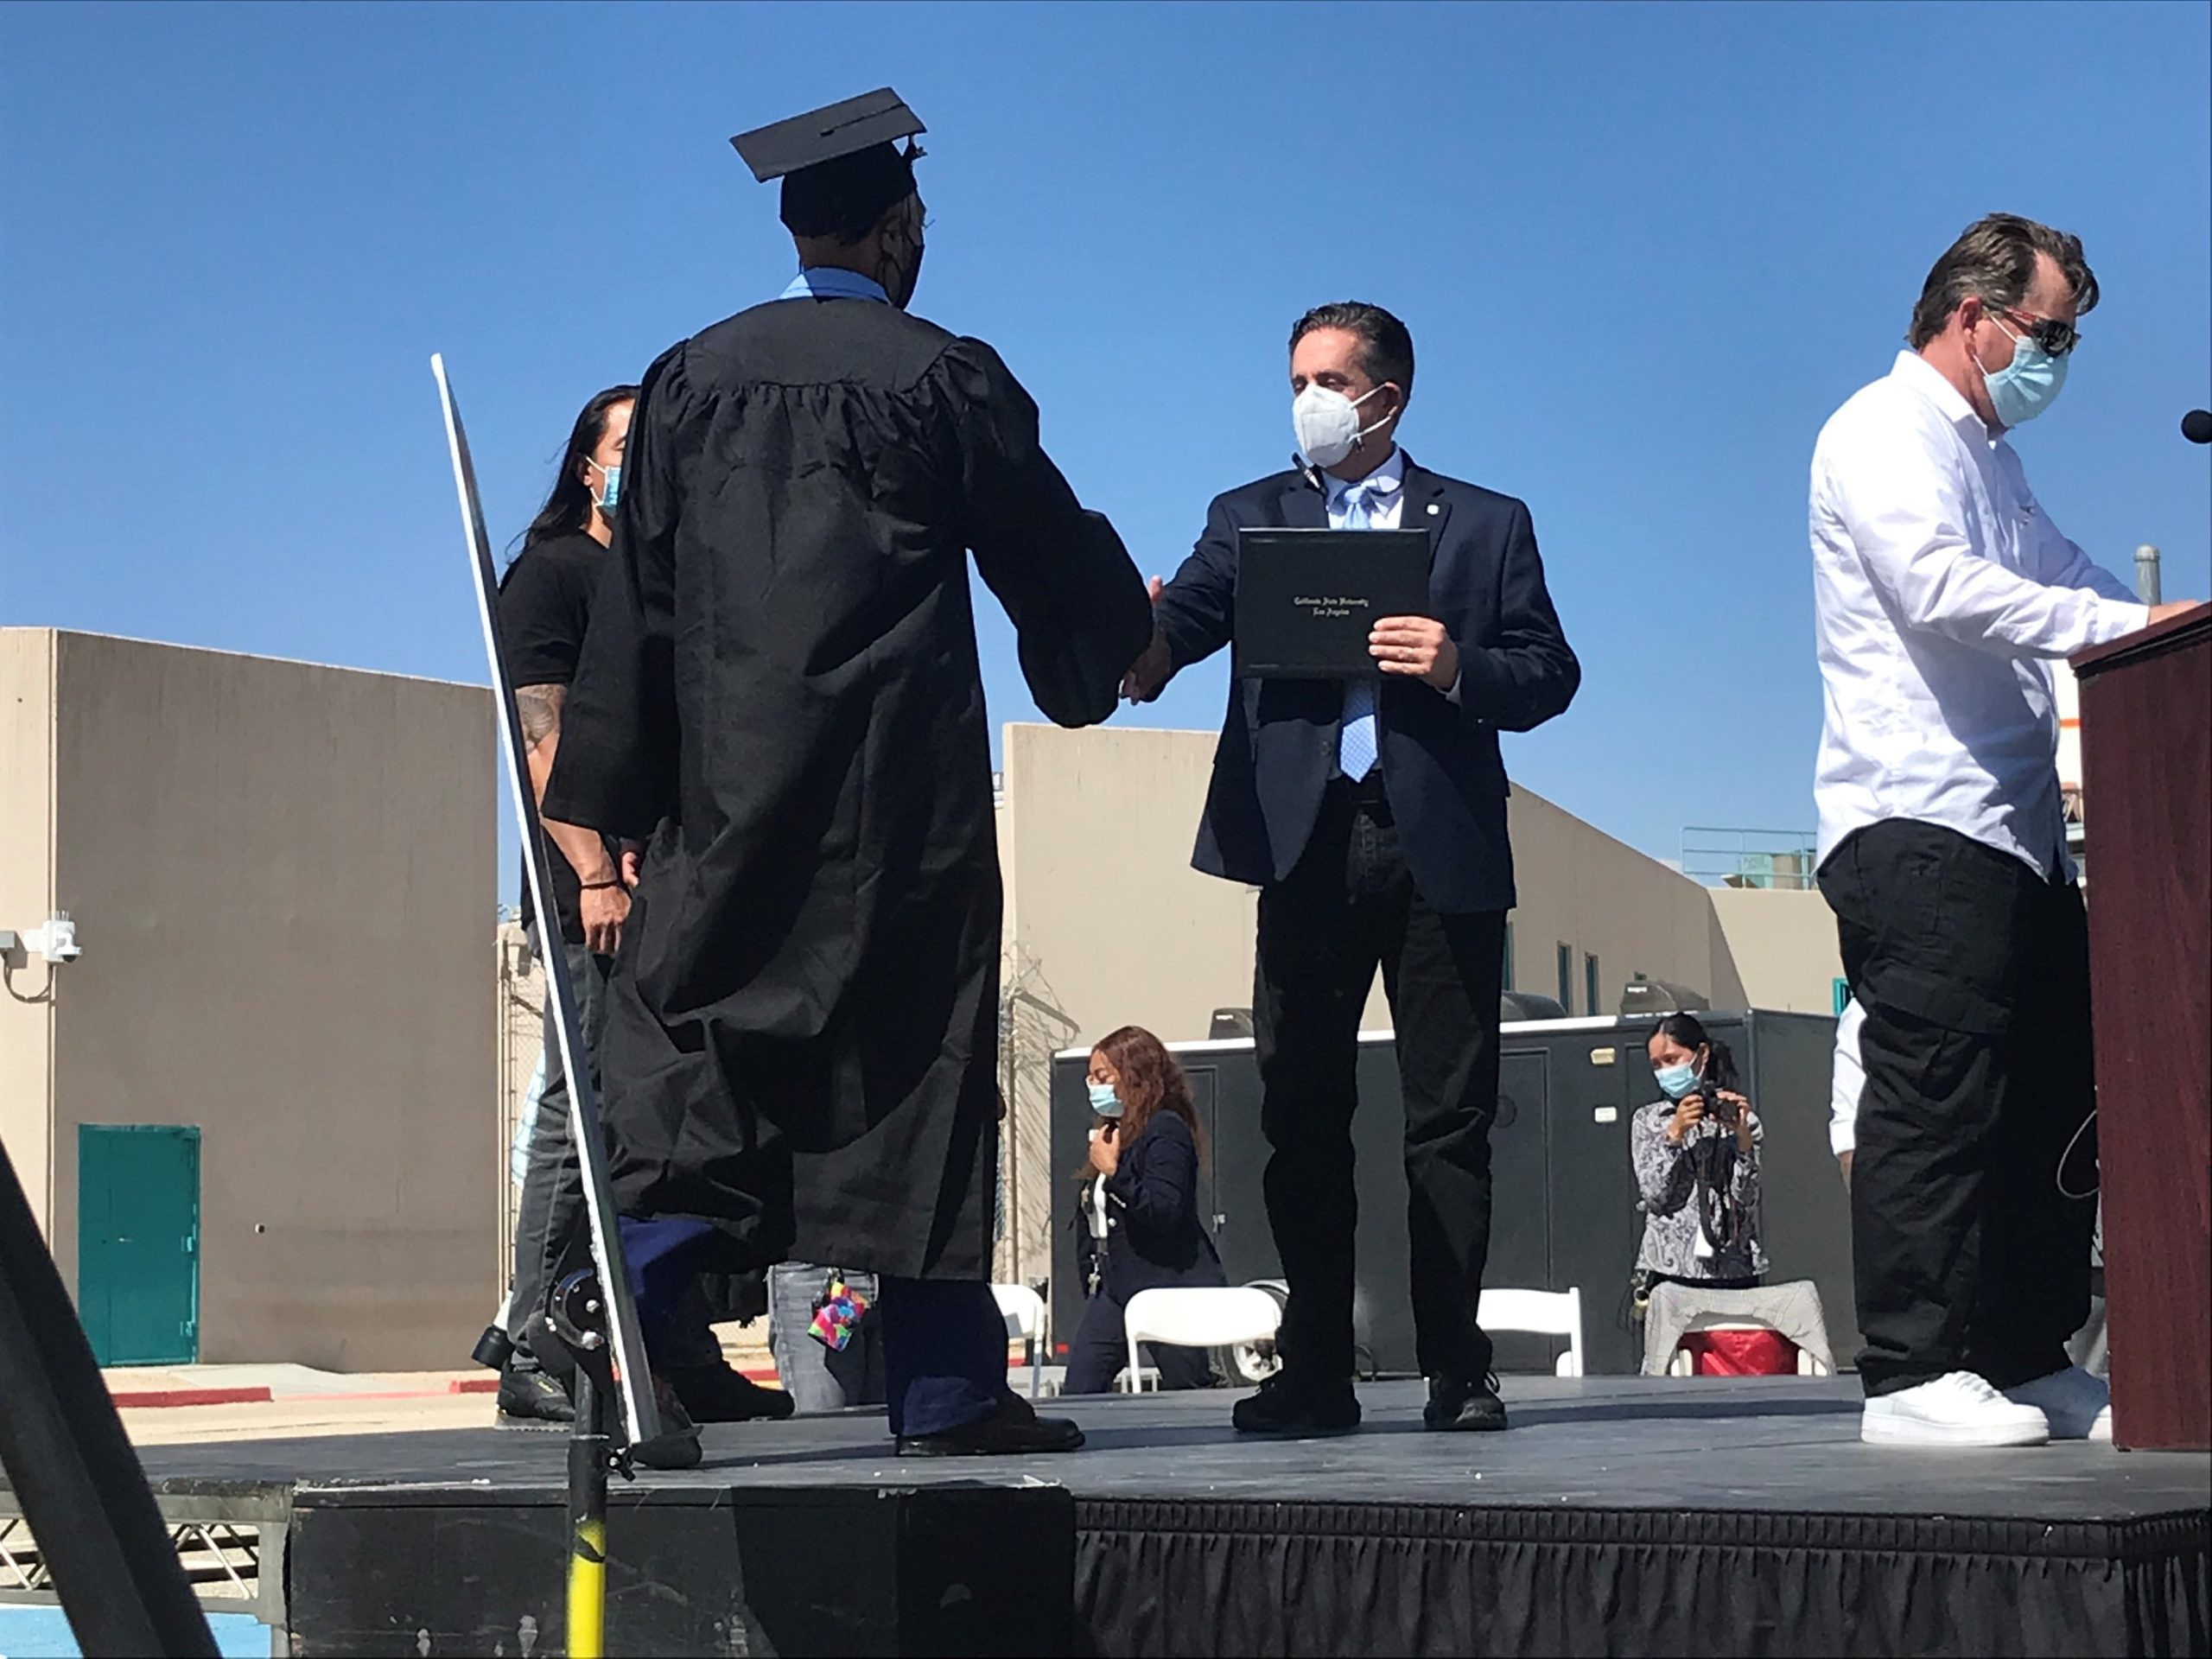 image of graduate receiving a certificate